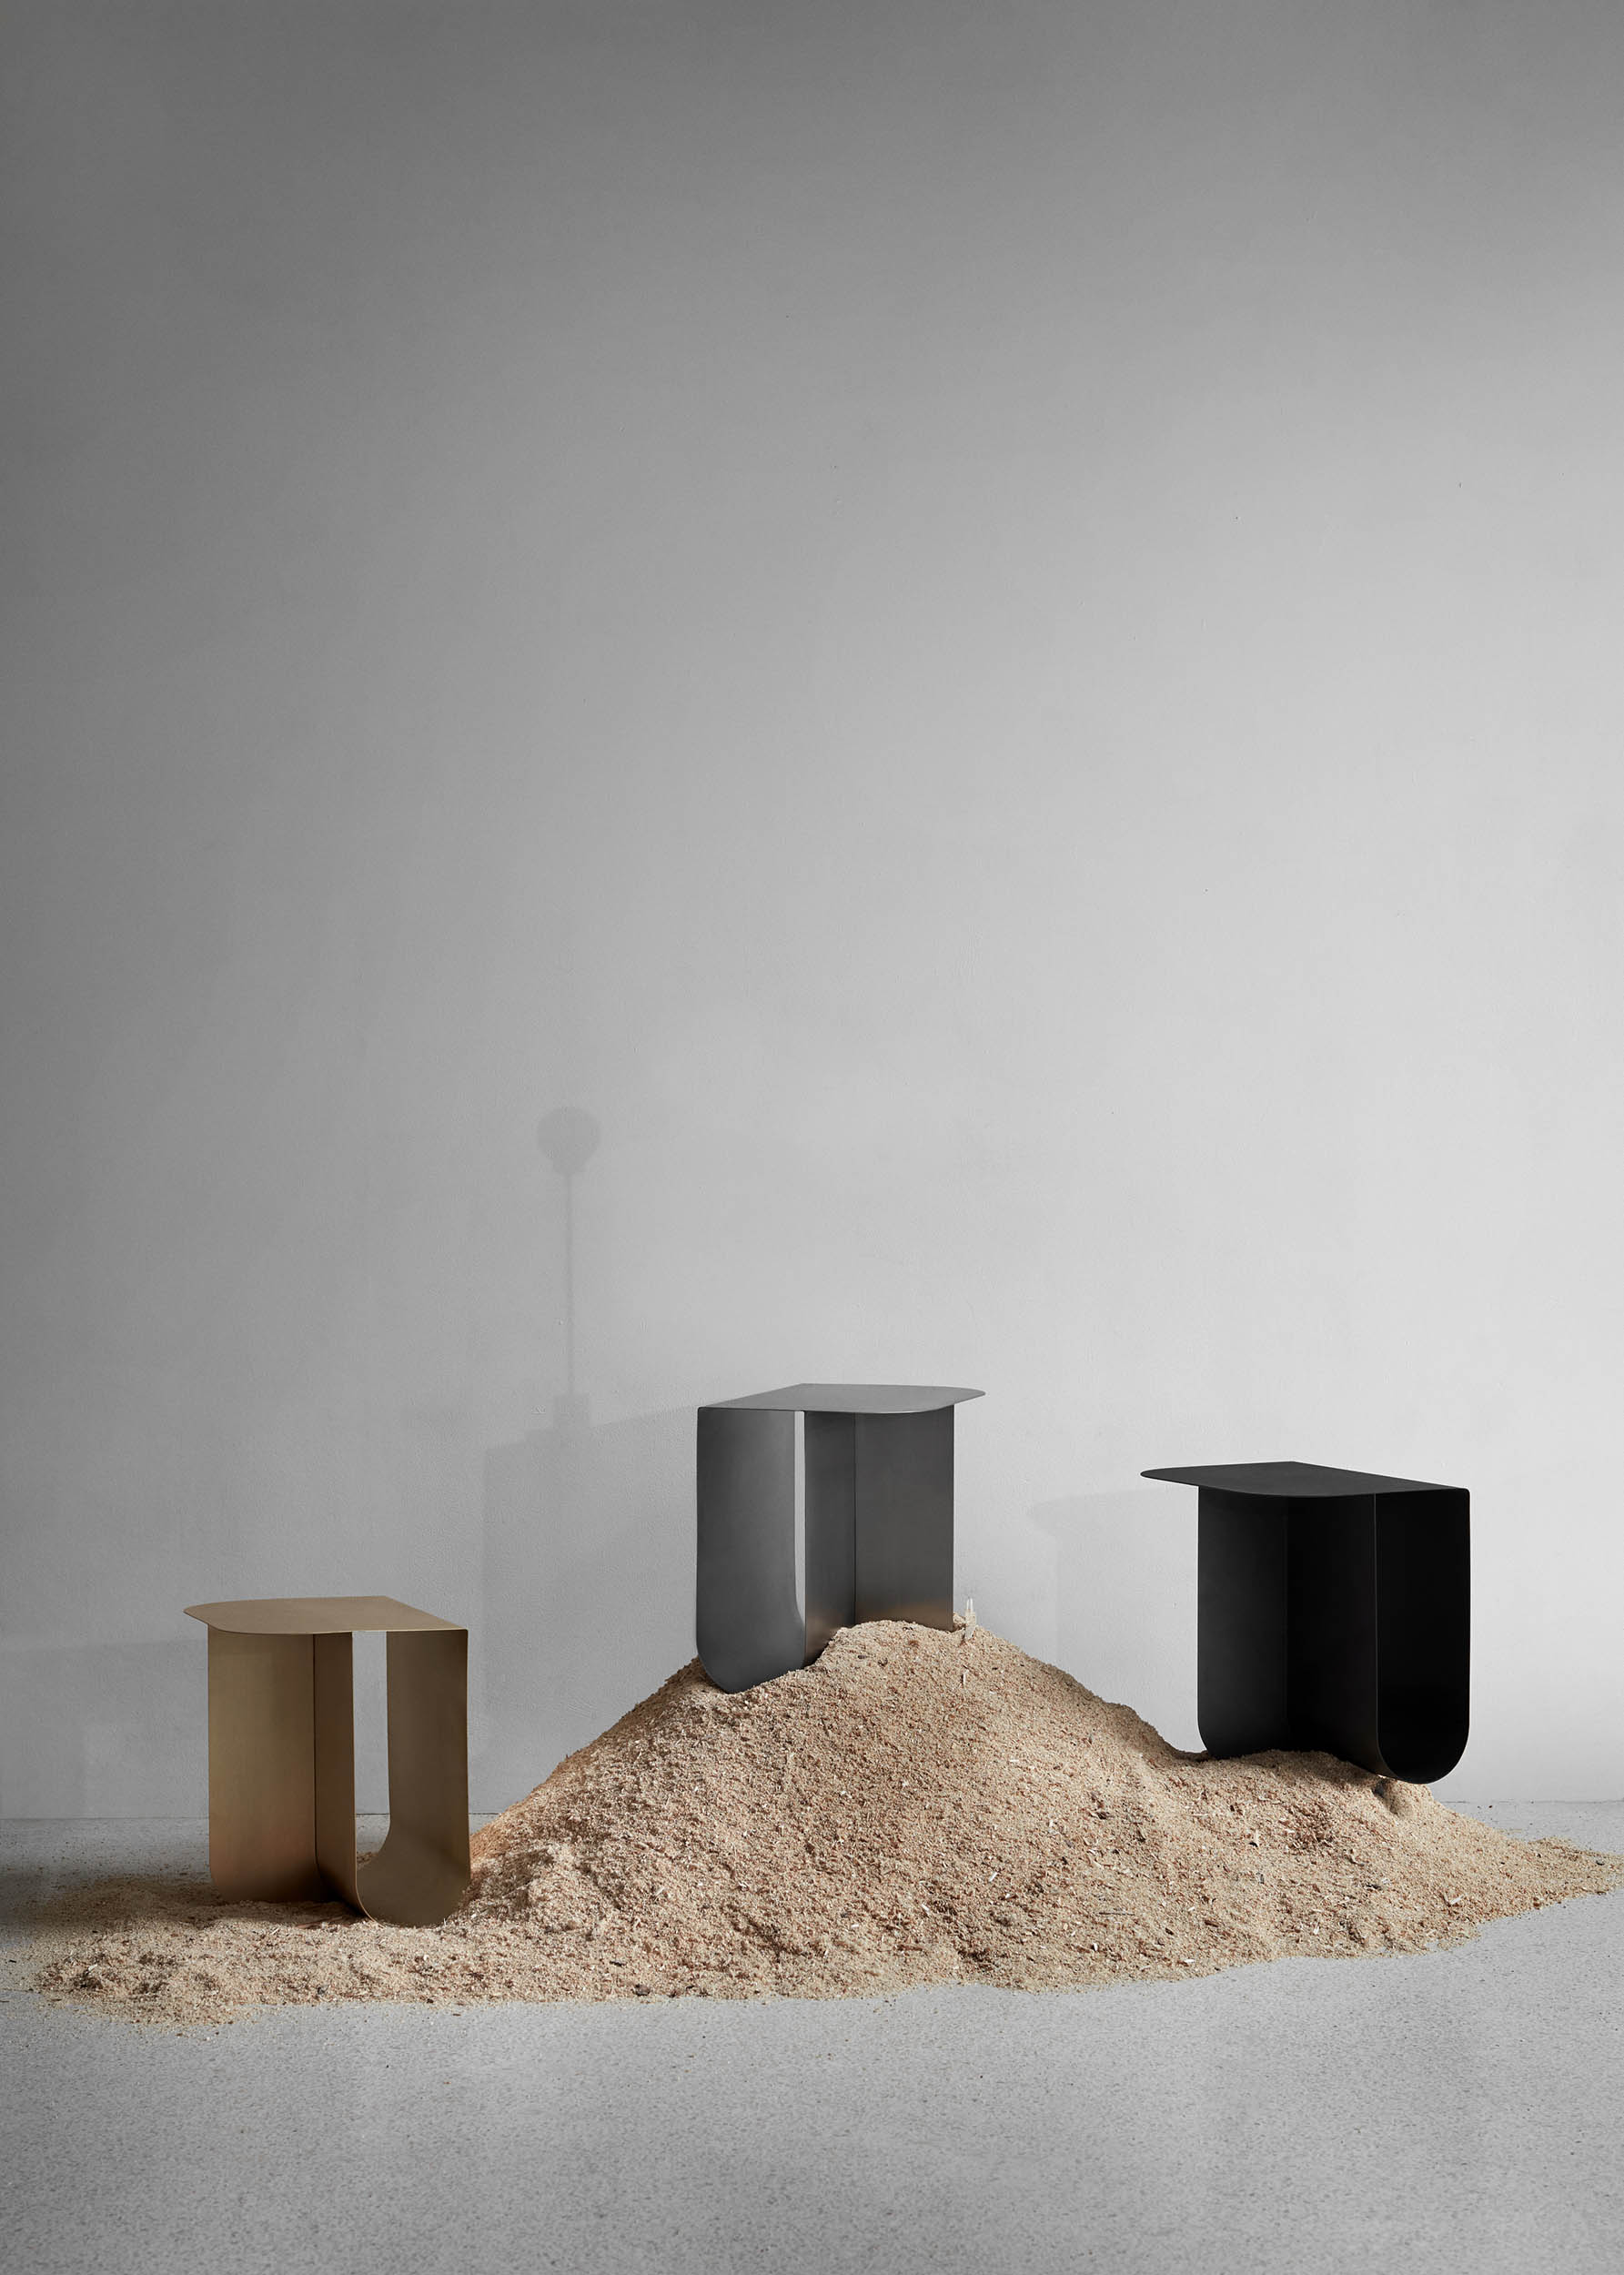 Mass_table_3colours_sawdust_illusion_Northern_photo_Chris_Tonnesen-Low-res